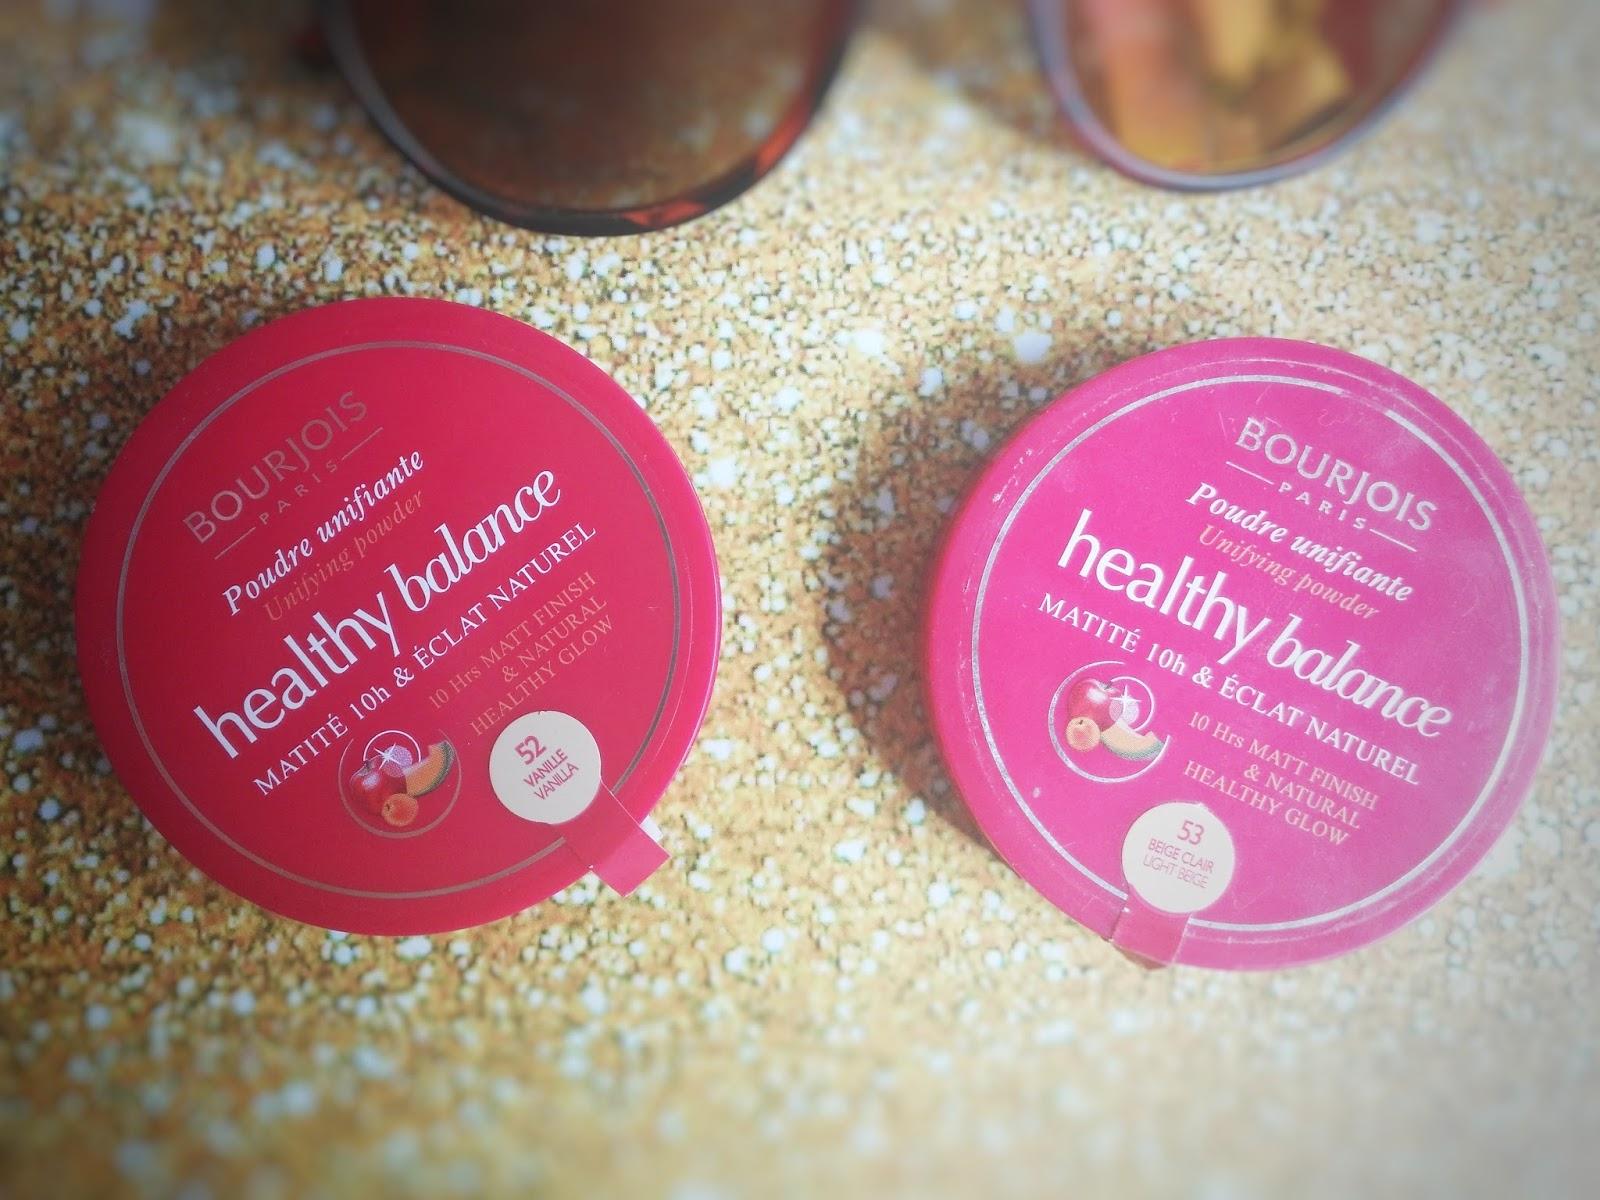 Bourjois Healthy Balance - puder w kamieniu, mój hit